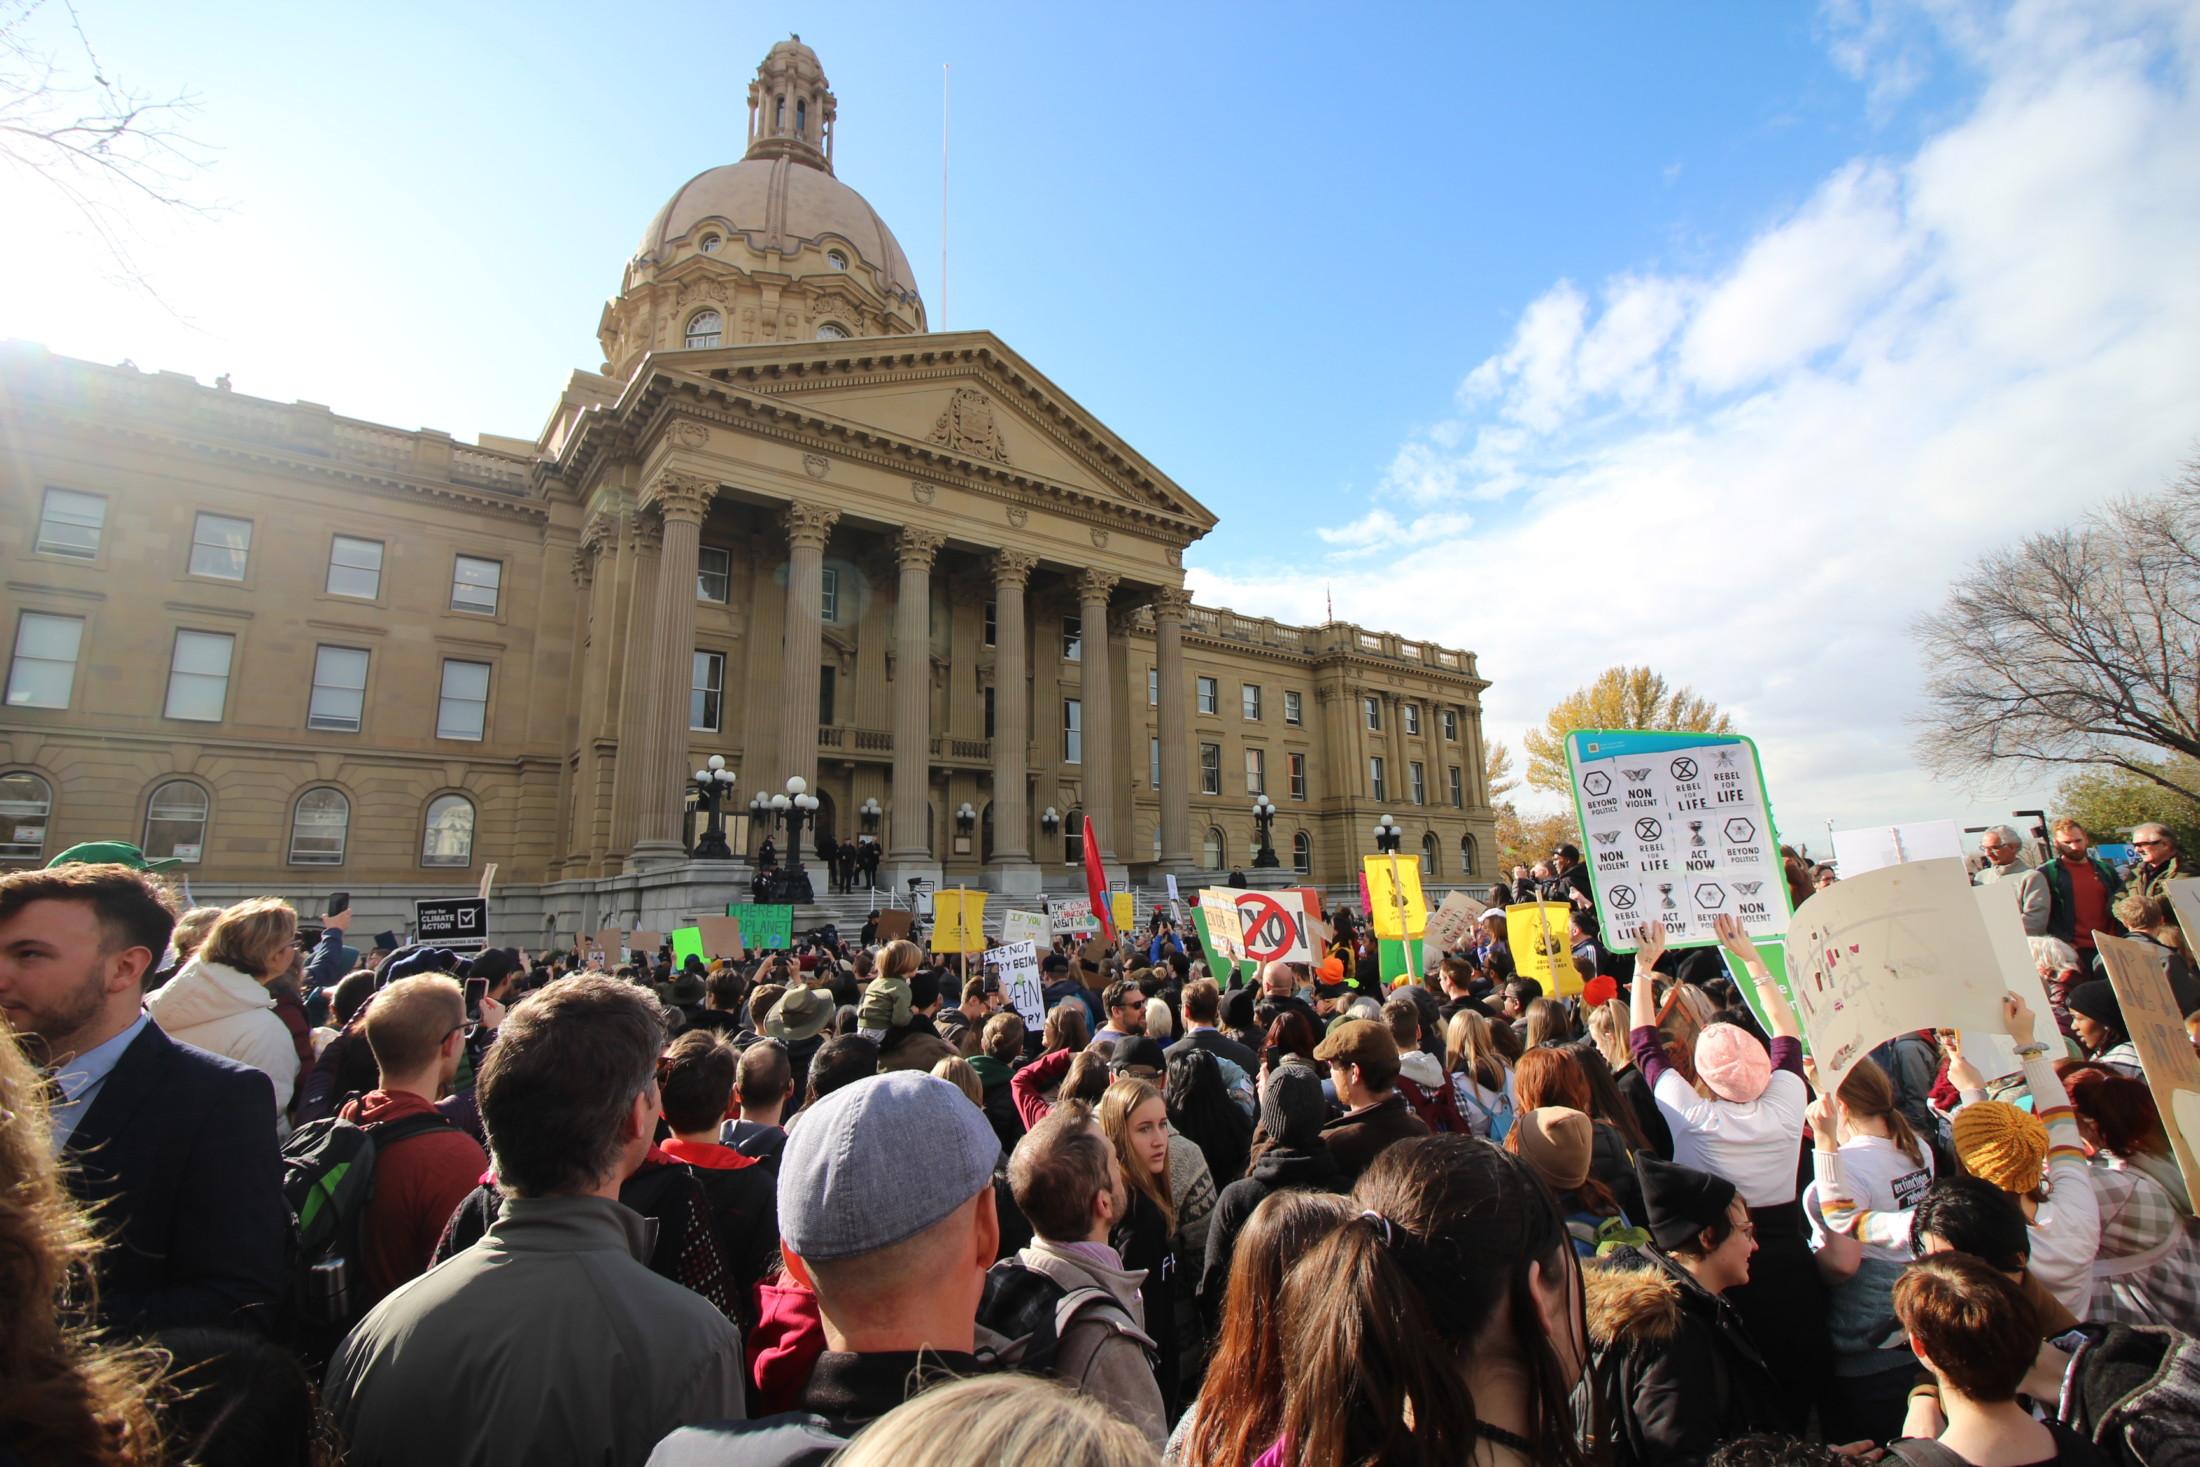 climate rally Greta Thunberg Edmonton Alberta activism